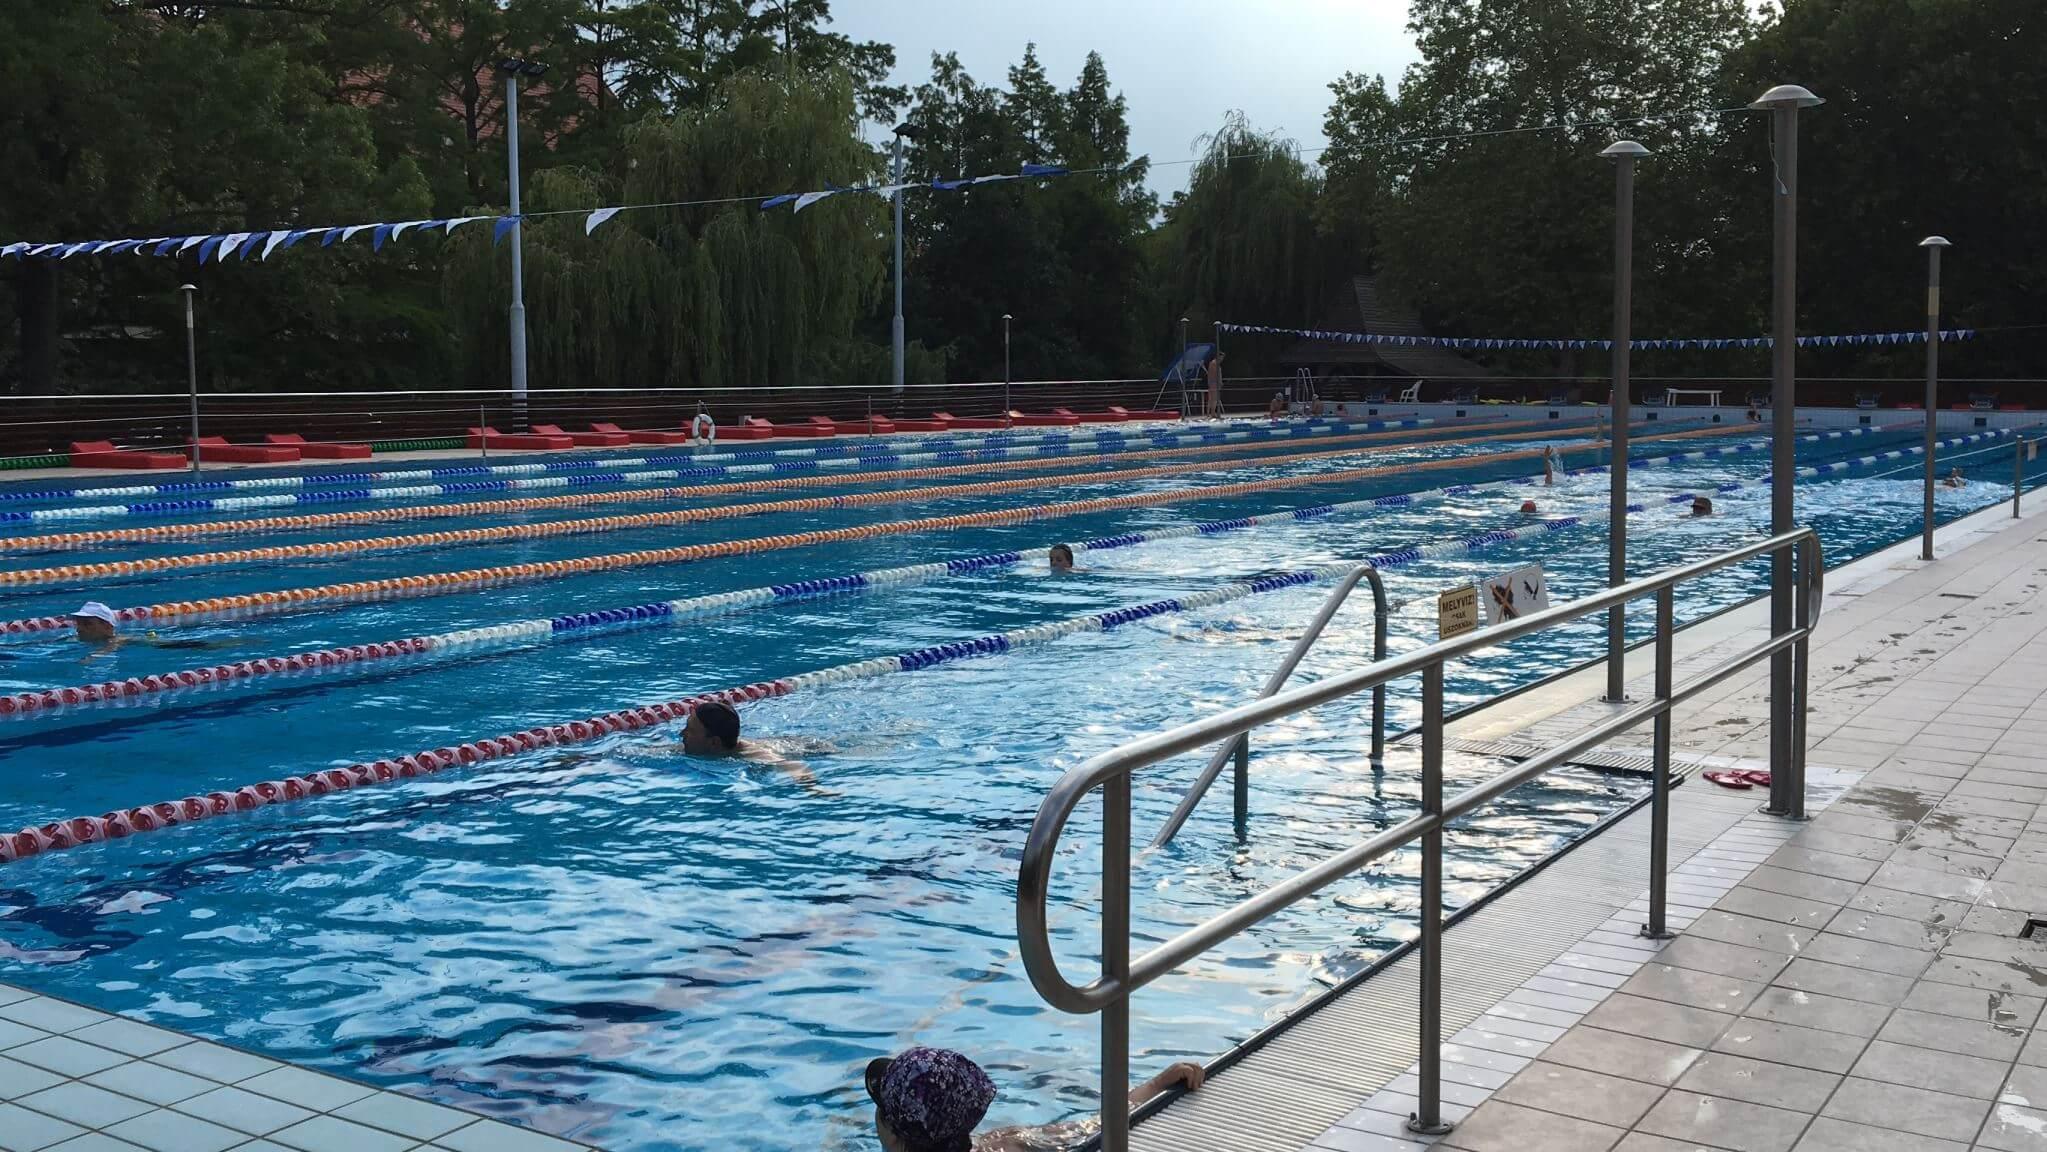 Olympic Swimming Pool, Gyula, Hungary